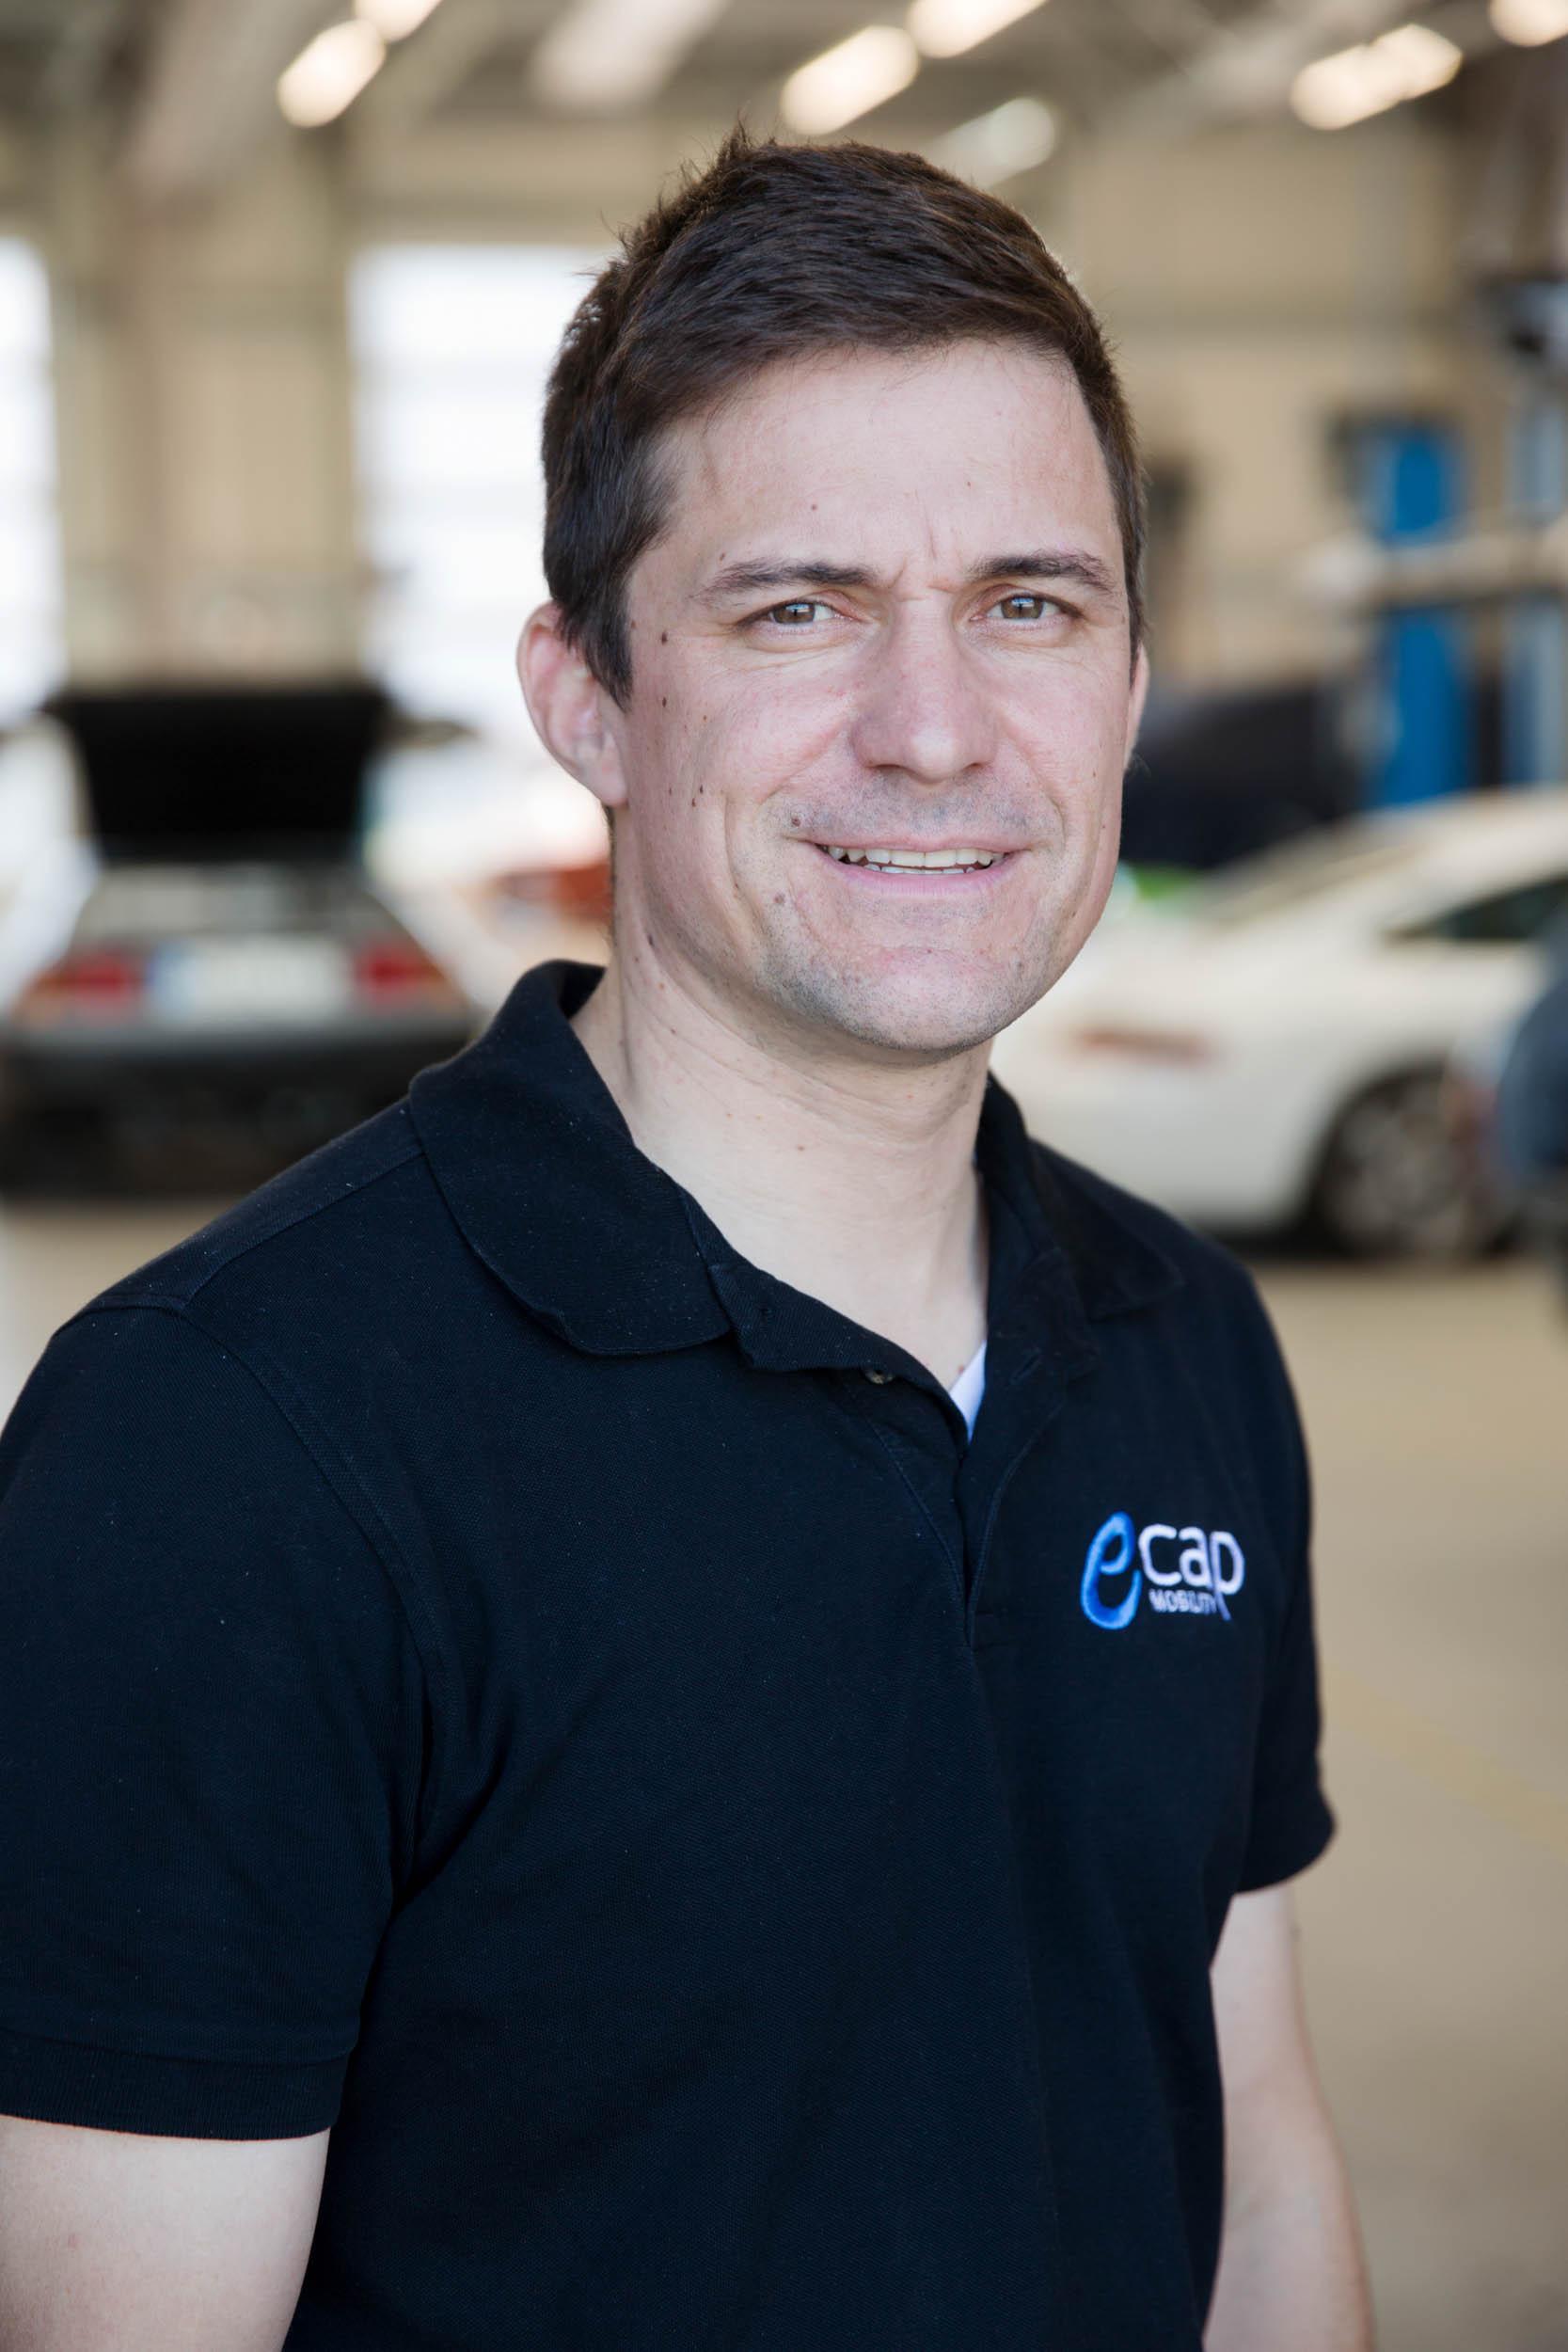 Clemens Lange | Locksmith & Welder cla@ecap-mobility.com